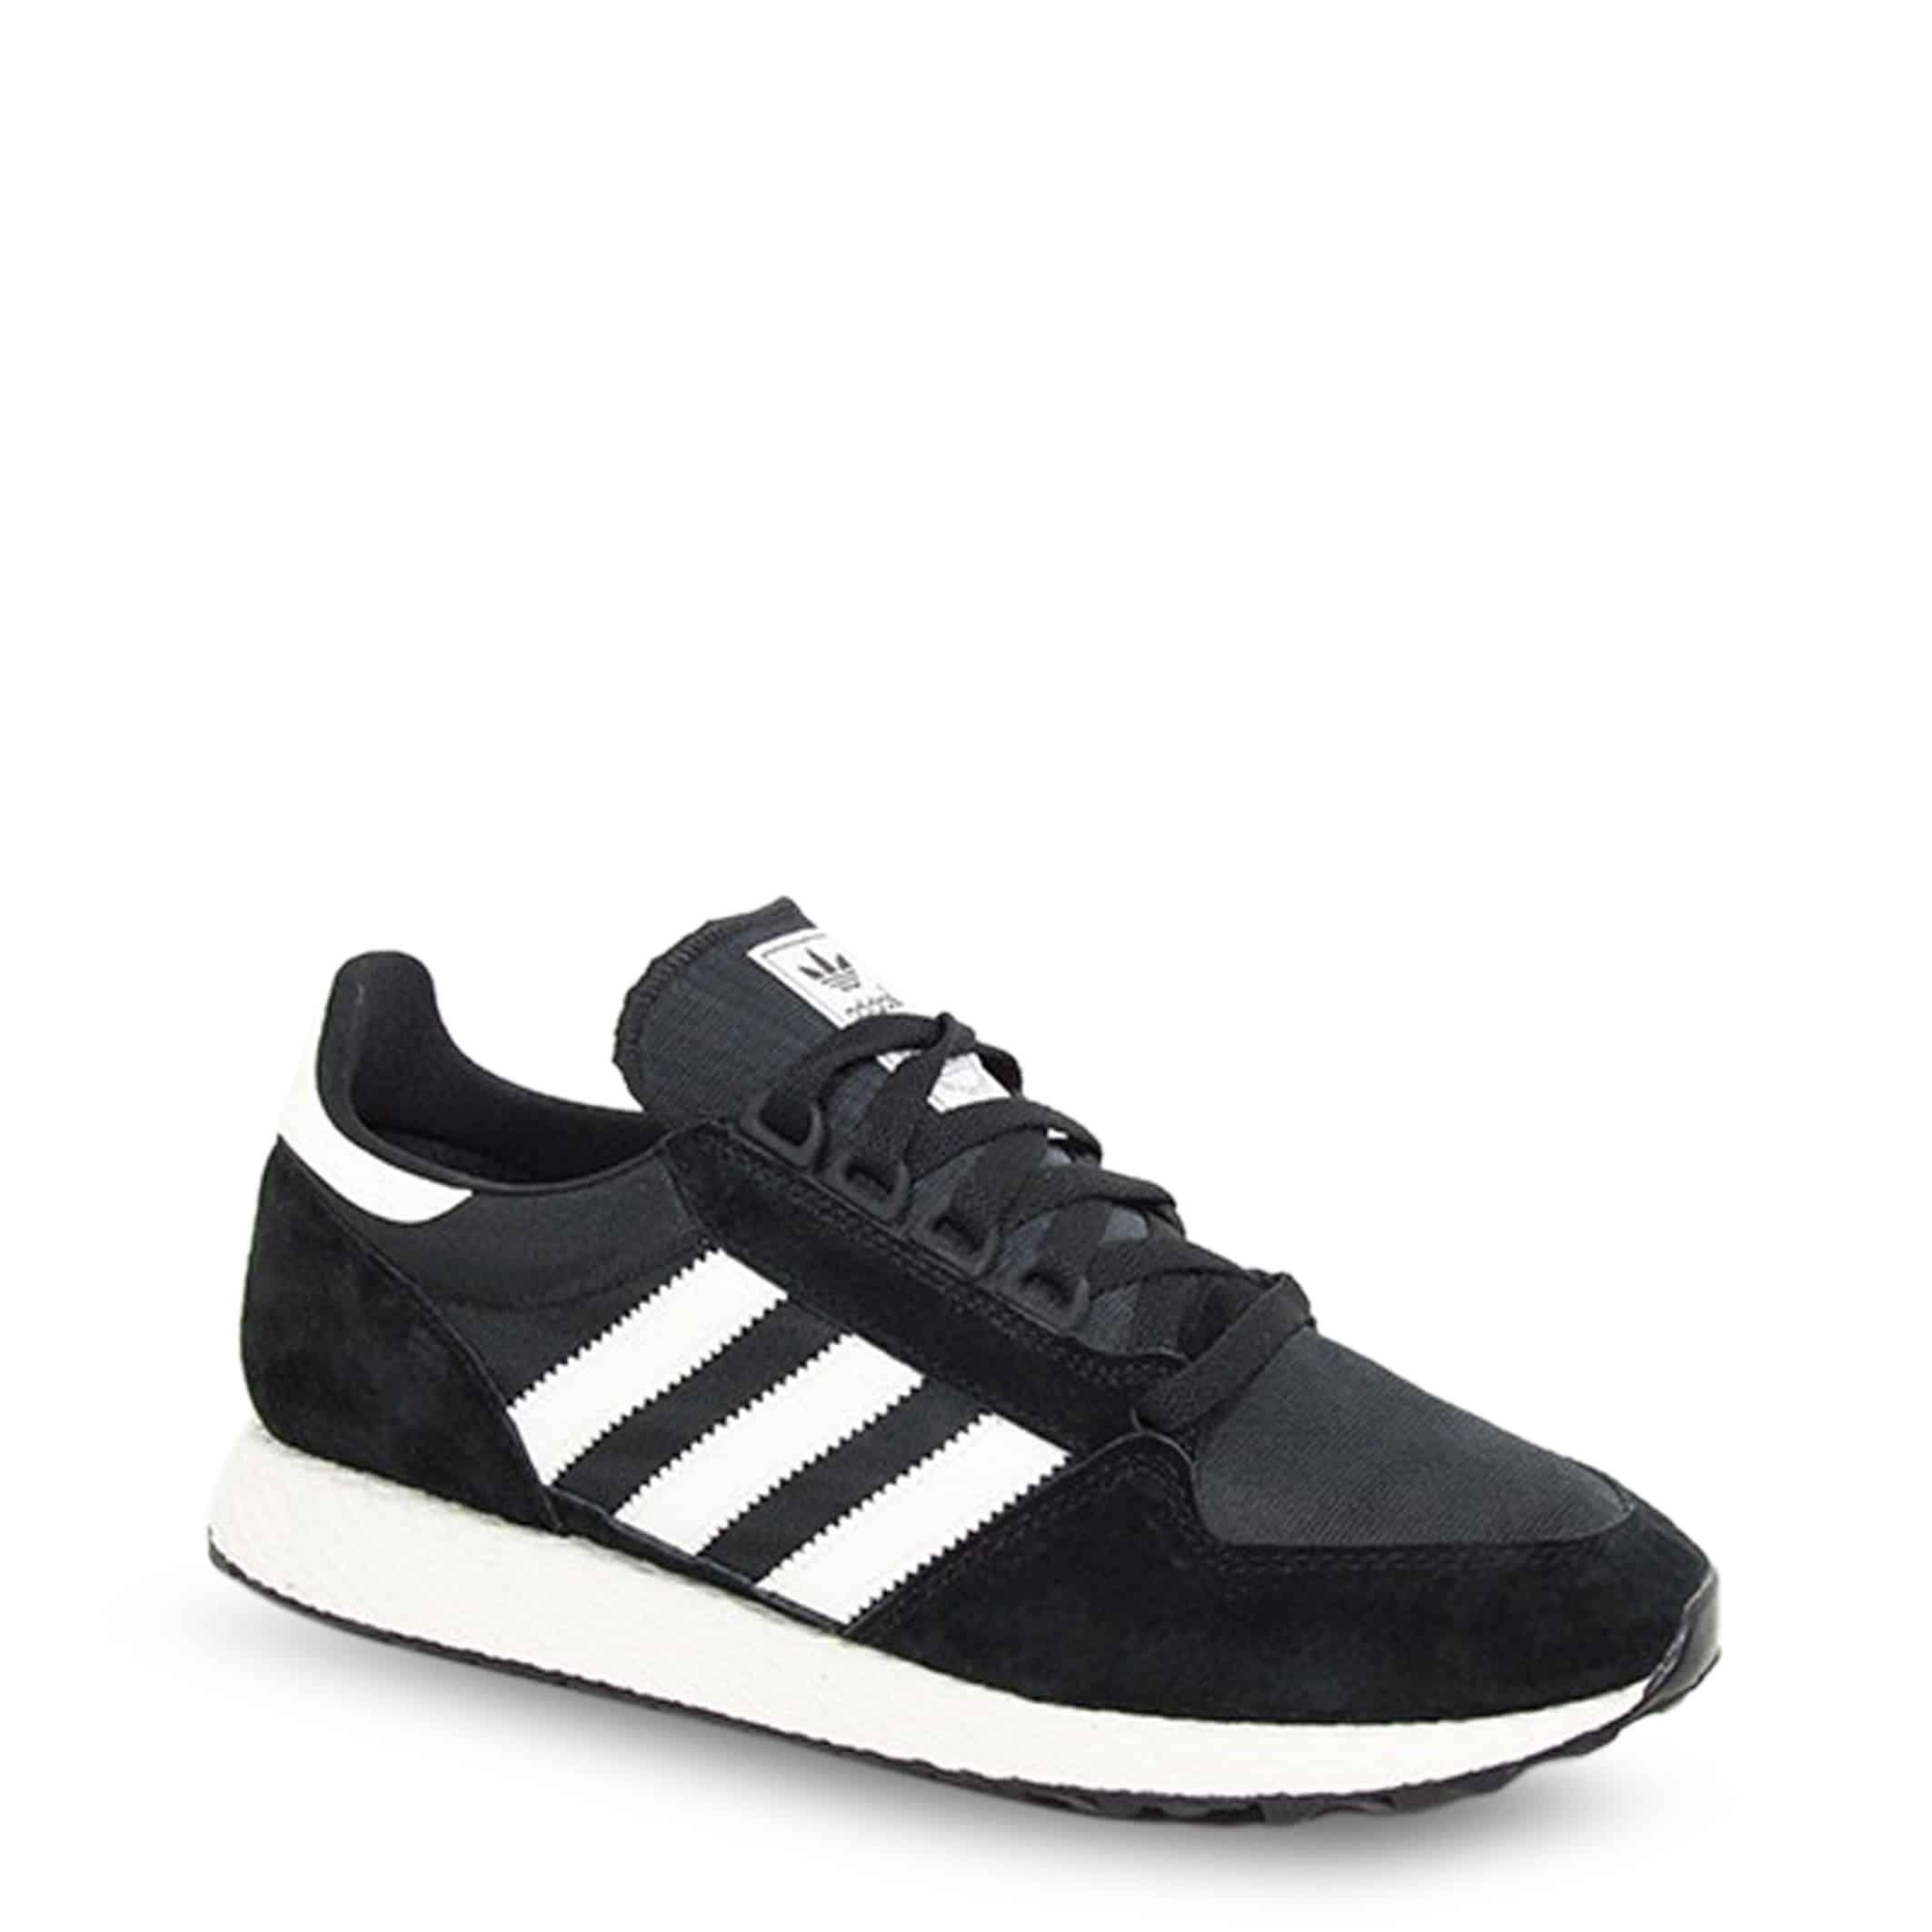 Adidas – ForestGrove – Nero